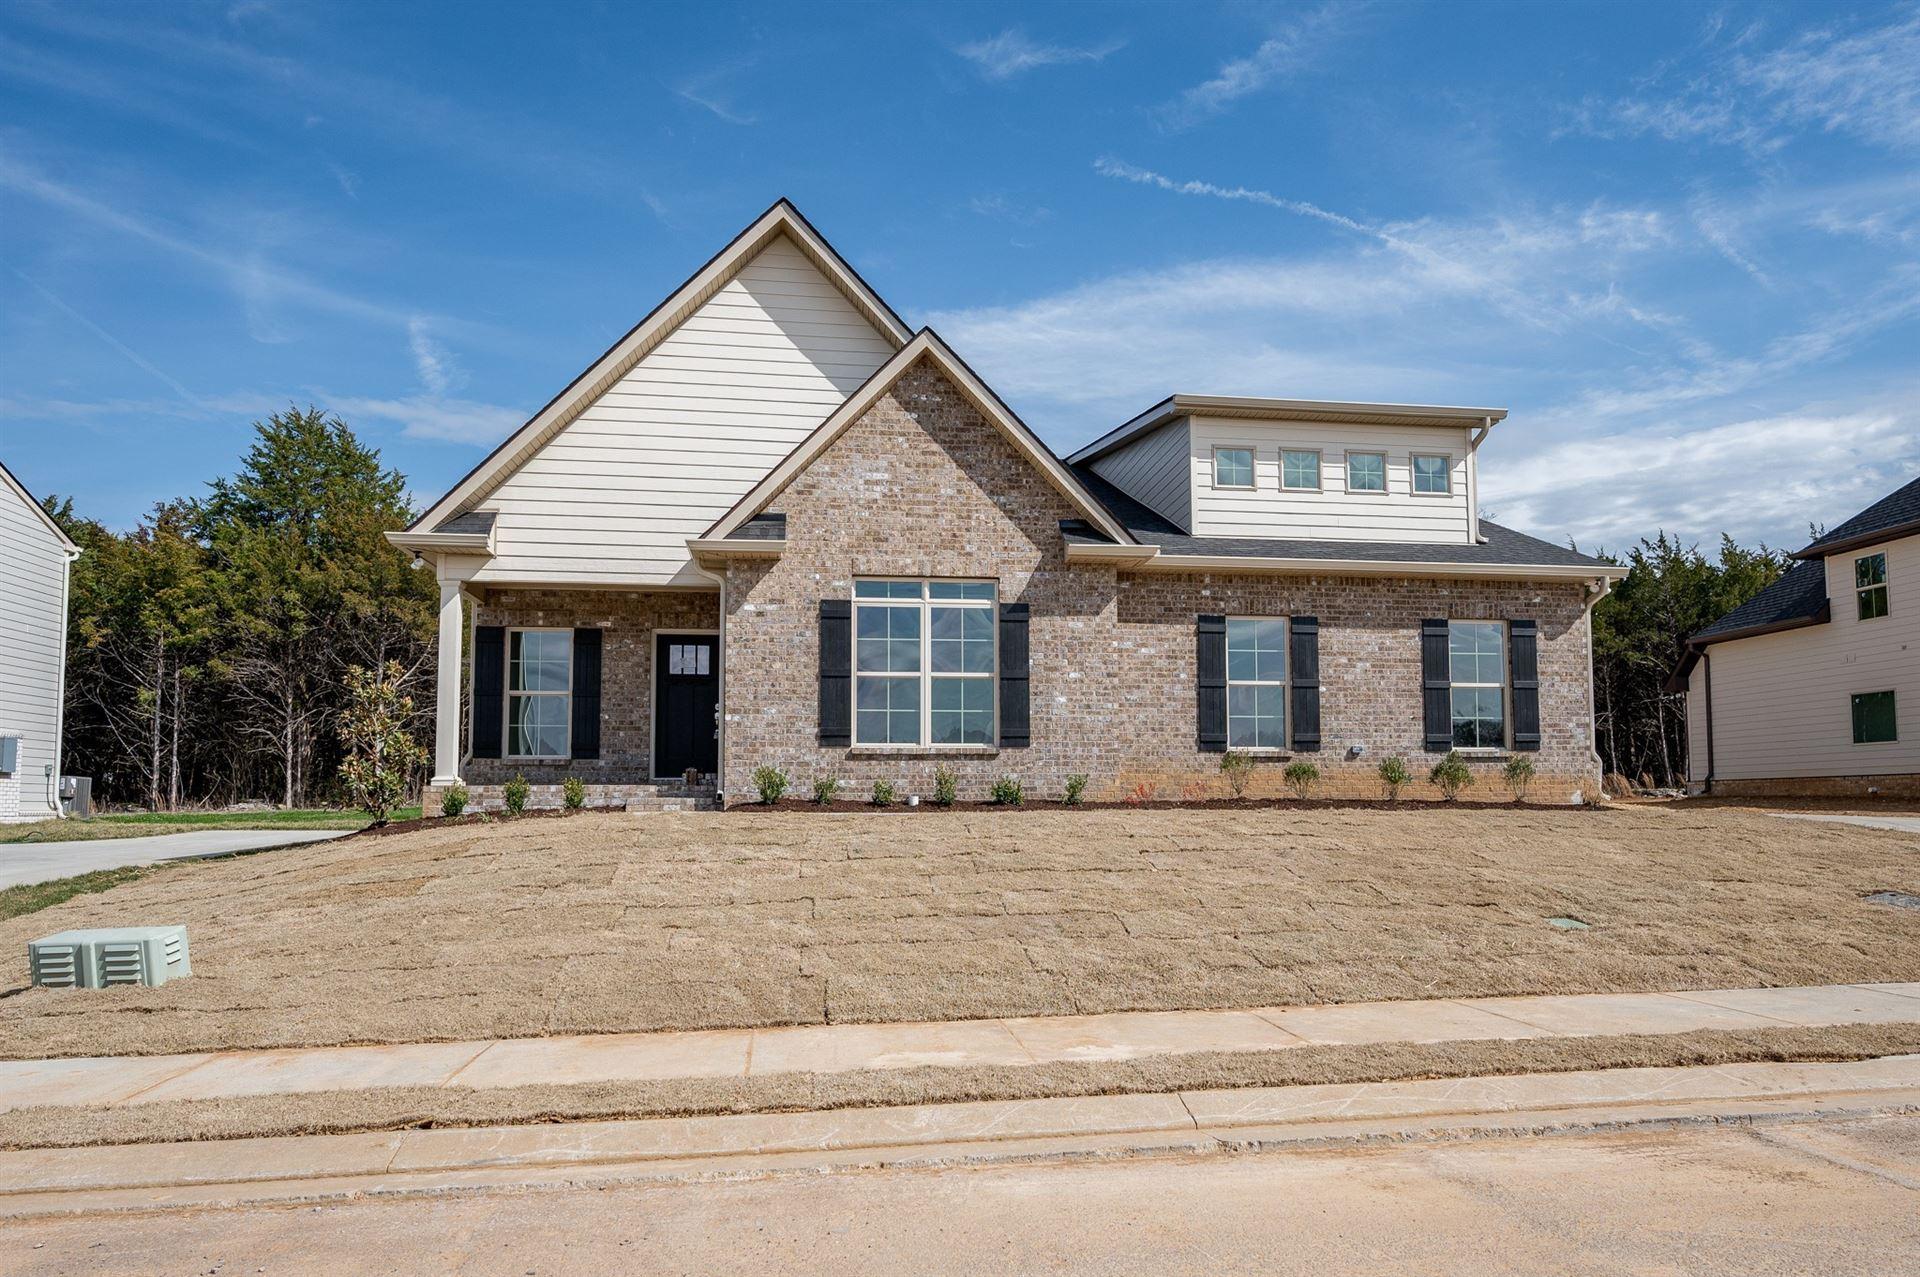 Photo of 0 Sandstone Circle, Murfreesboro, TN 37130 (MLS # 2253576)